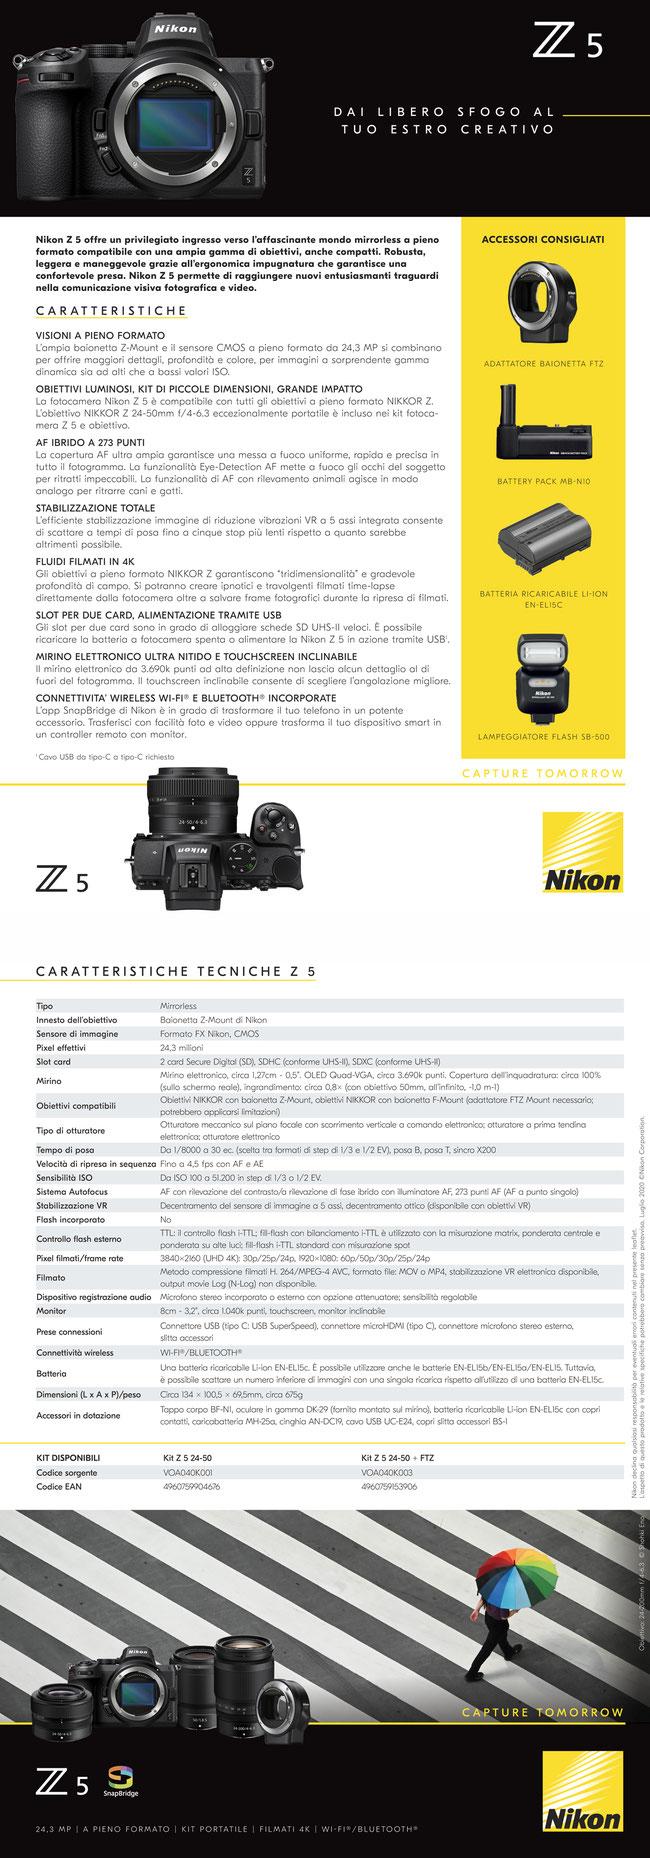 nikon-z5-foto-ottica-sodini-sardegna